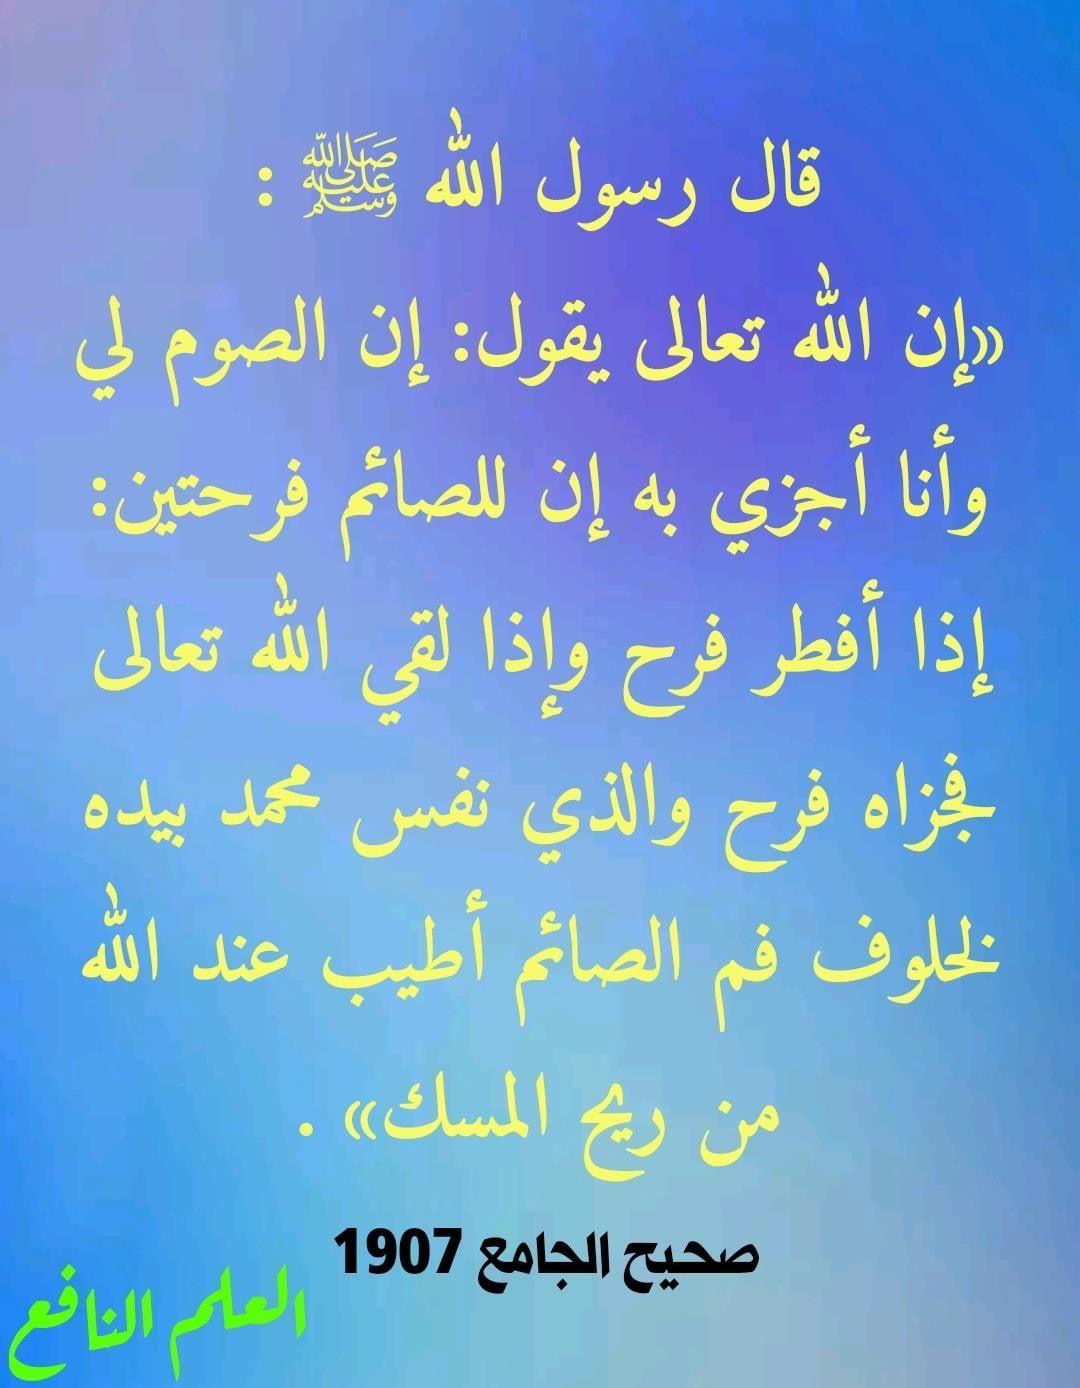 Pin By Saja Trad On I Love Allah Quran Islam The Prophet Miracles Hadith Heaven Prophets Faith Prayer Dua حكم وعبر احاديث الله اسلام قرآن دعاء Ramadan Hadith Jye